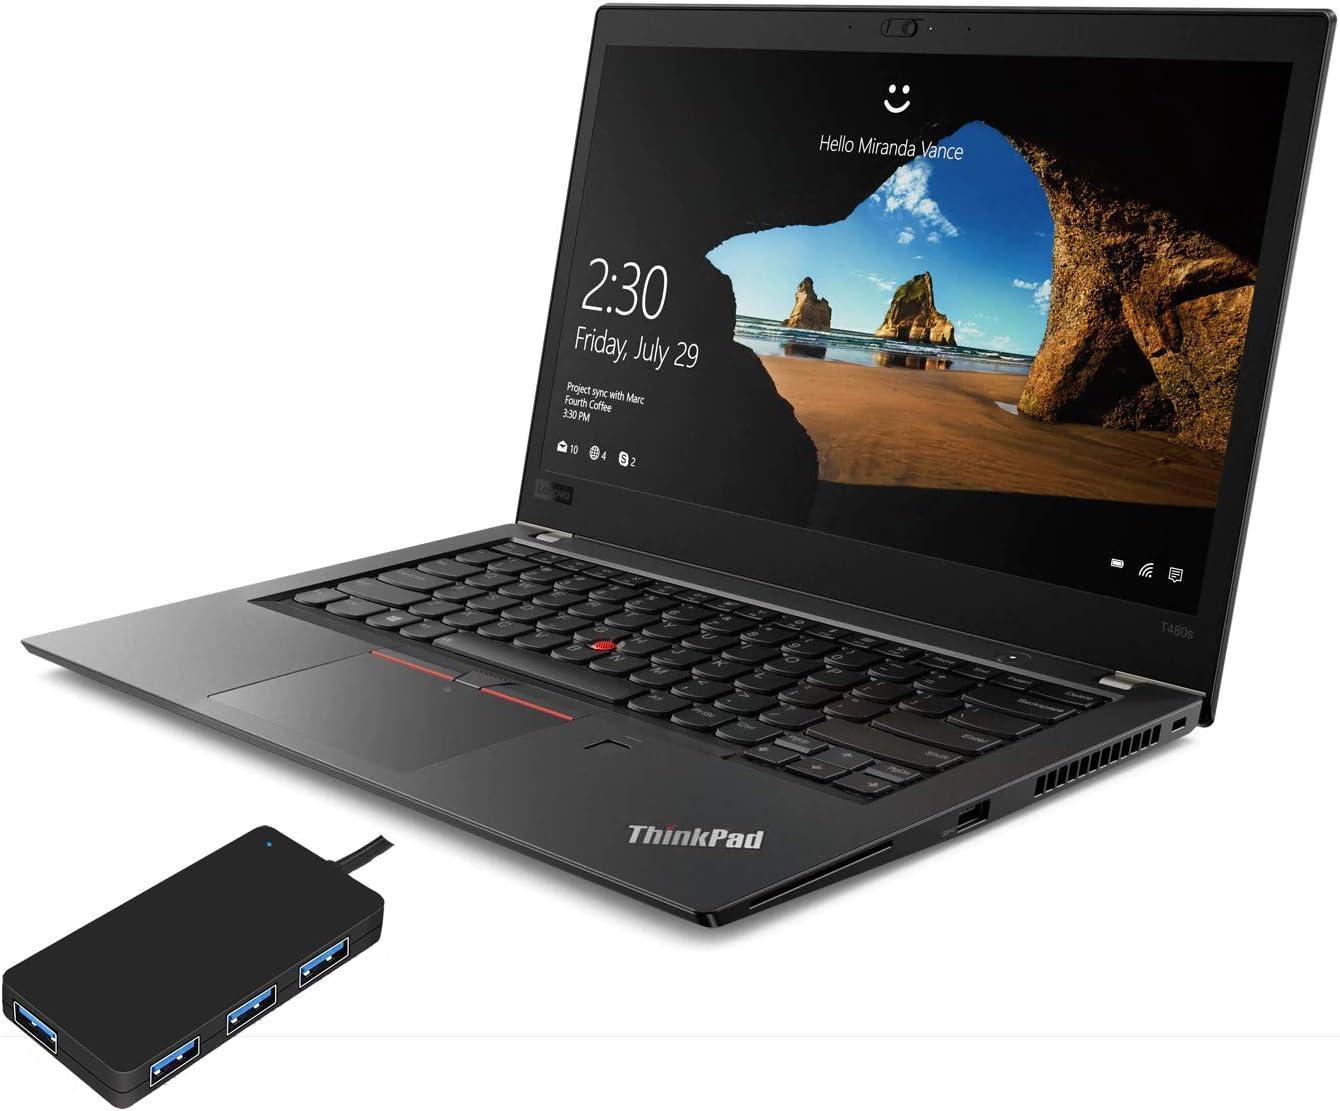 "Lenovo ThinkPad T480s Home and Business Laptop (Intel i7-8650U 4-Core, 40GB RAM, 512GB PCIe SSD, Intel UHD 620, 14.0"" Full HD (1920x1080), Fingerprint, WiFi, Bluetooth, Win 10 Pro) with USB Hub"